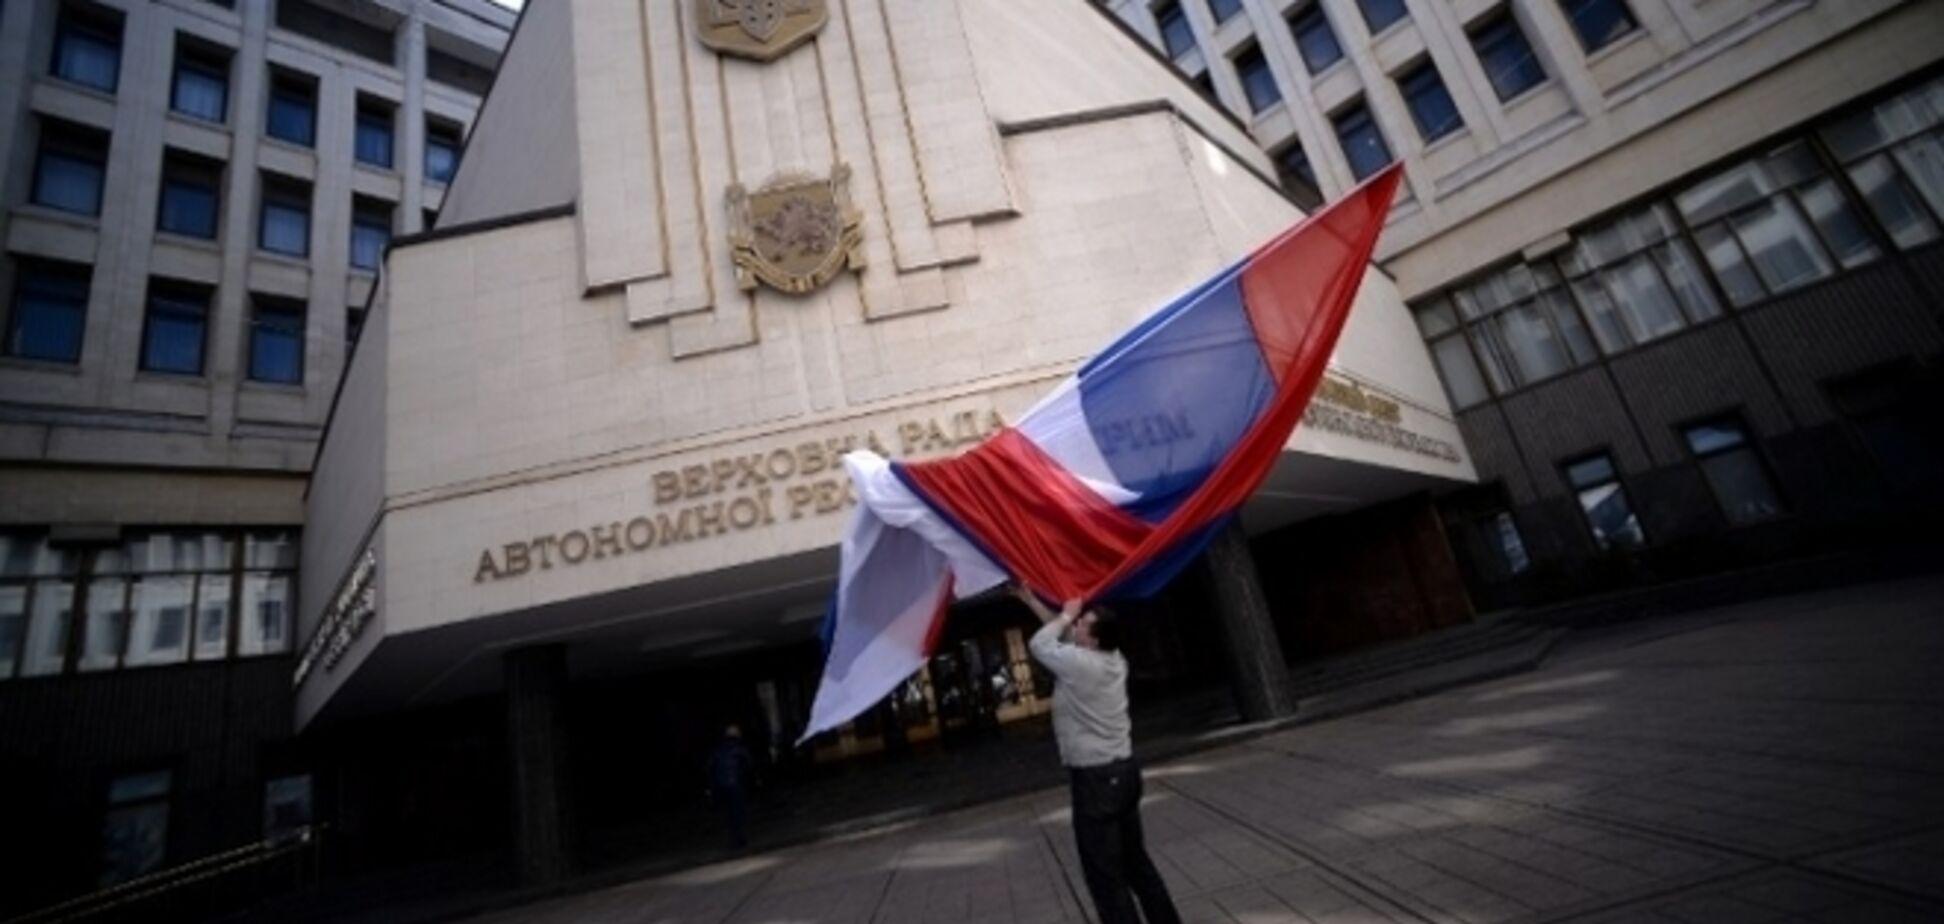 Минюст оценил ущерб от оккупации Крыма в триллион 80 миллиардов гривен